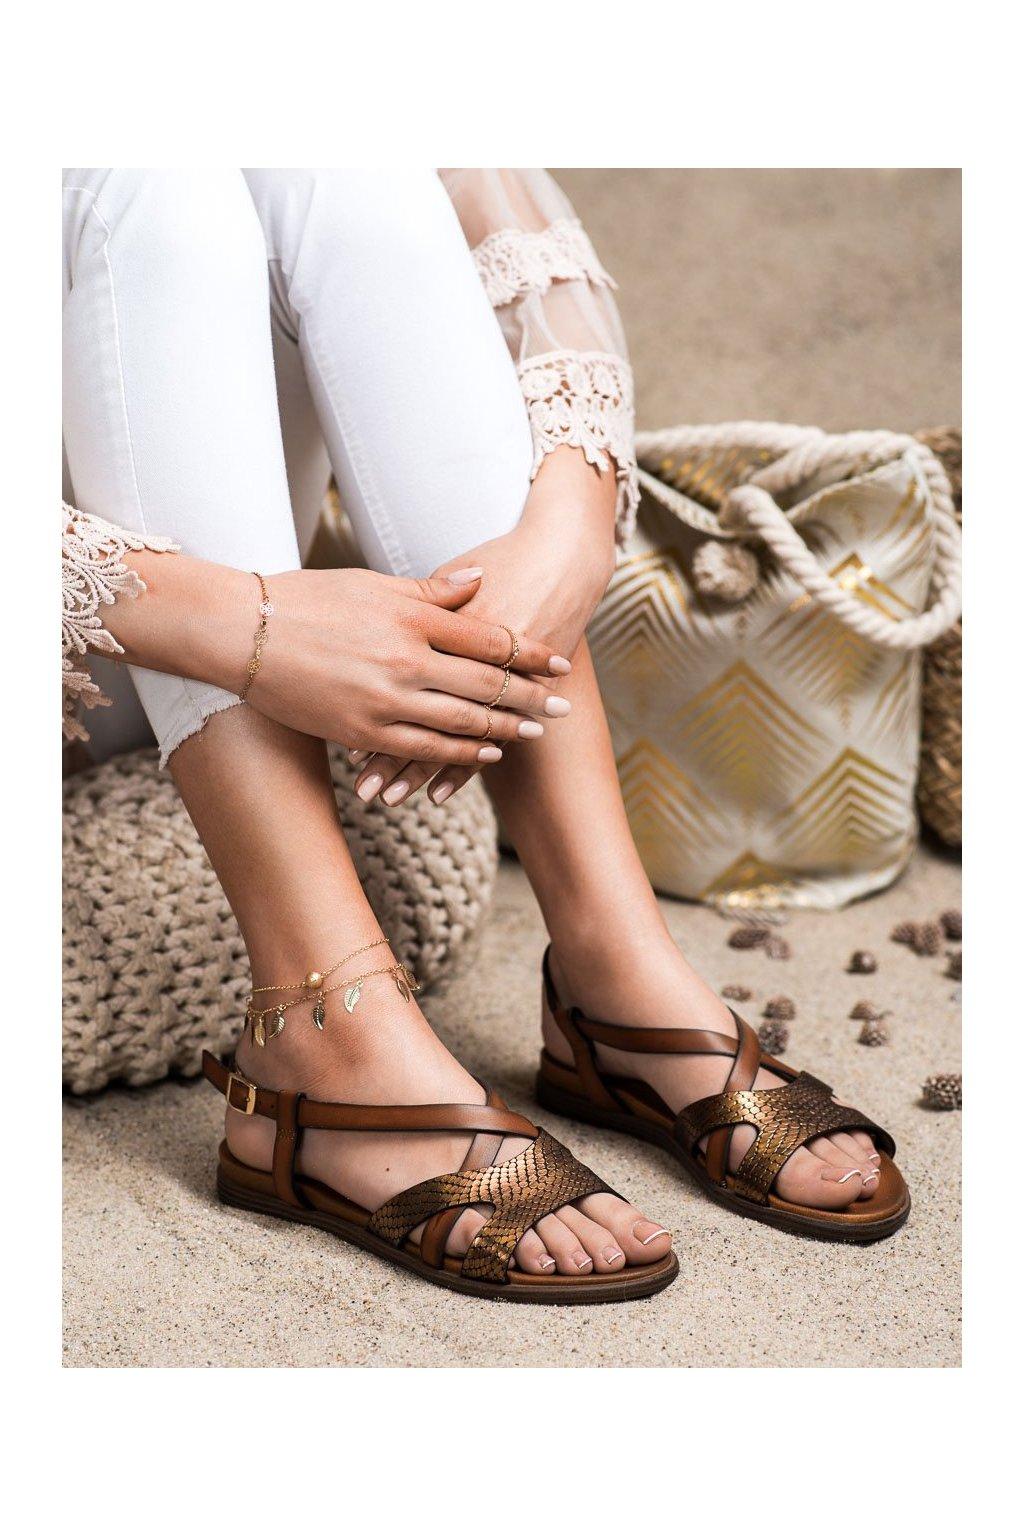 Hnedé sandále Sergio leone kod SK050BR